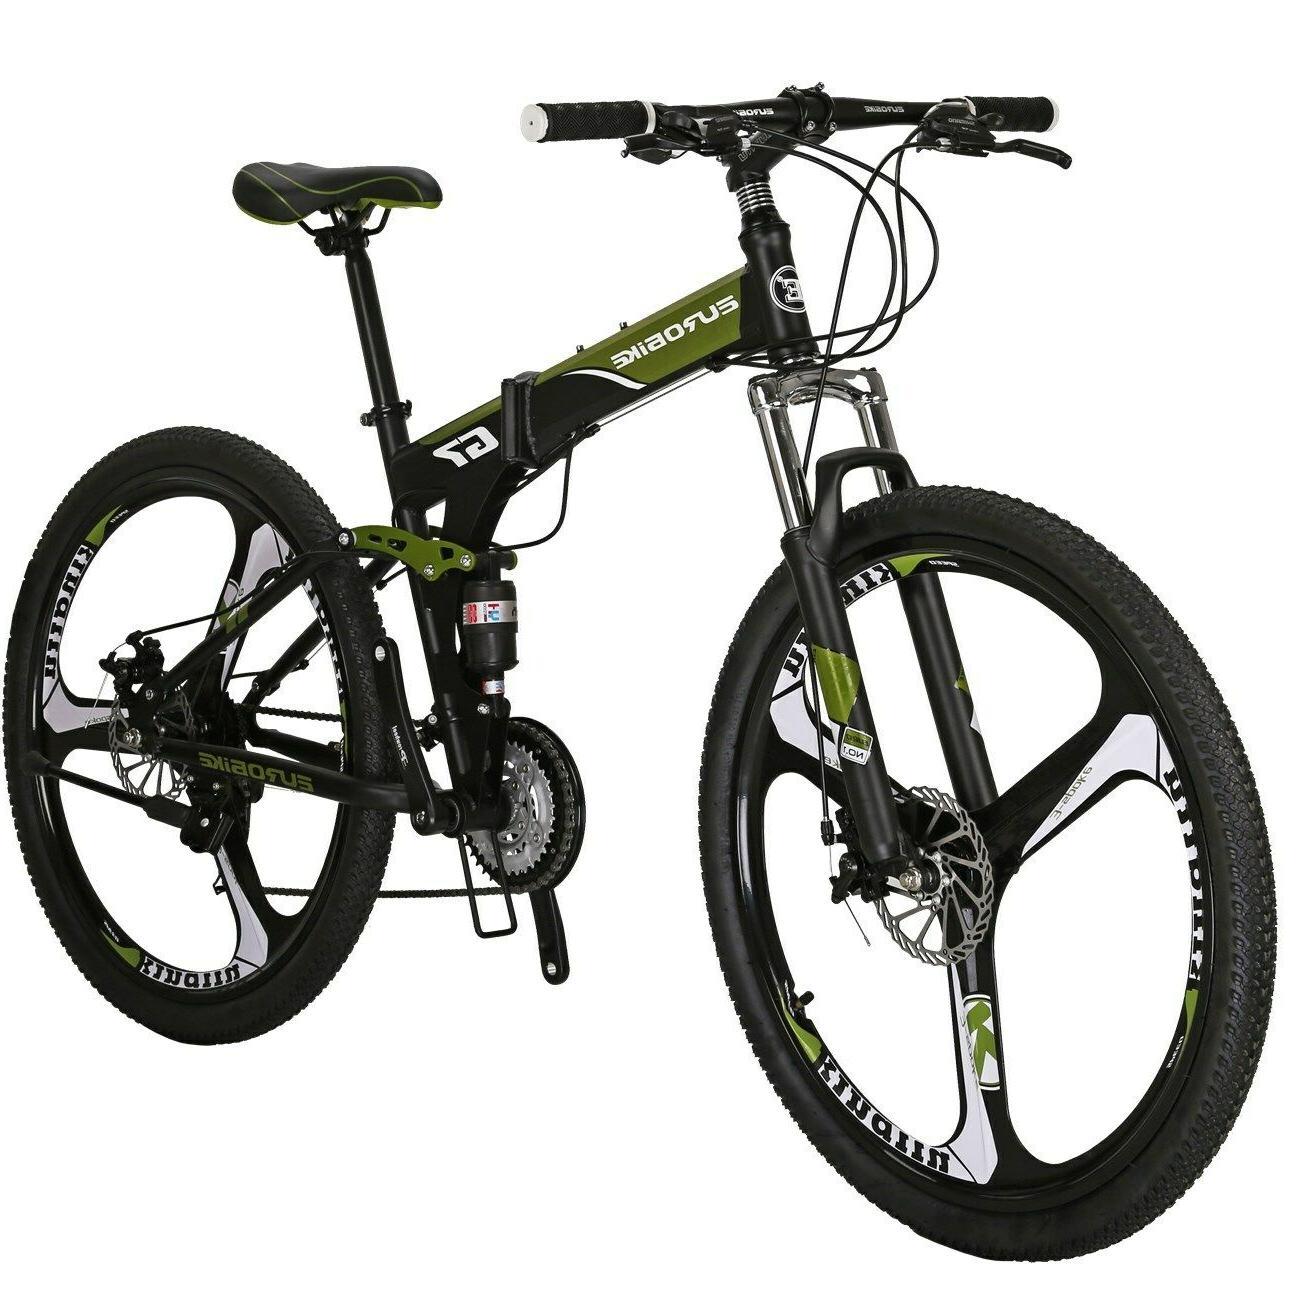 G7 Mountain 21 Speed Full Bicycle